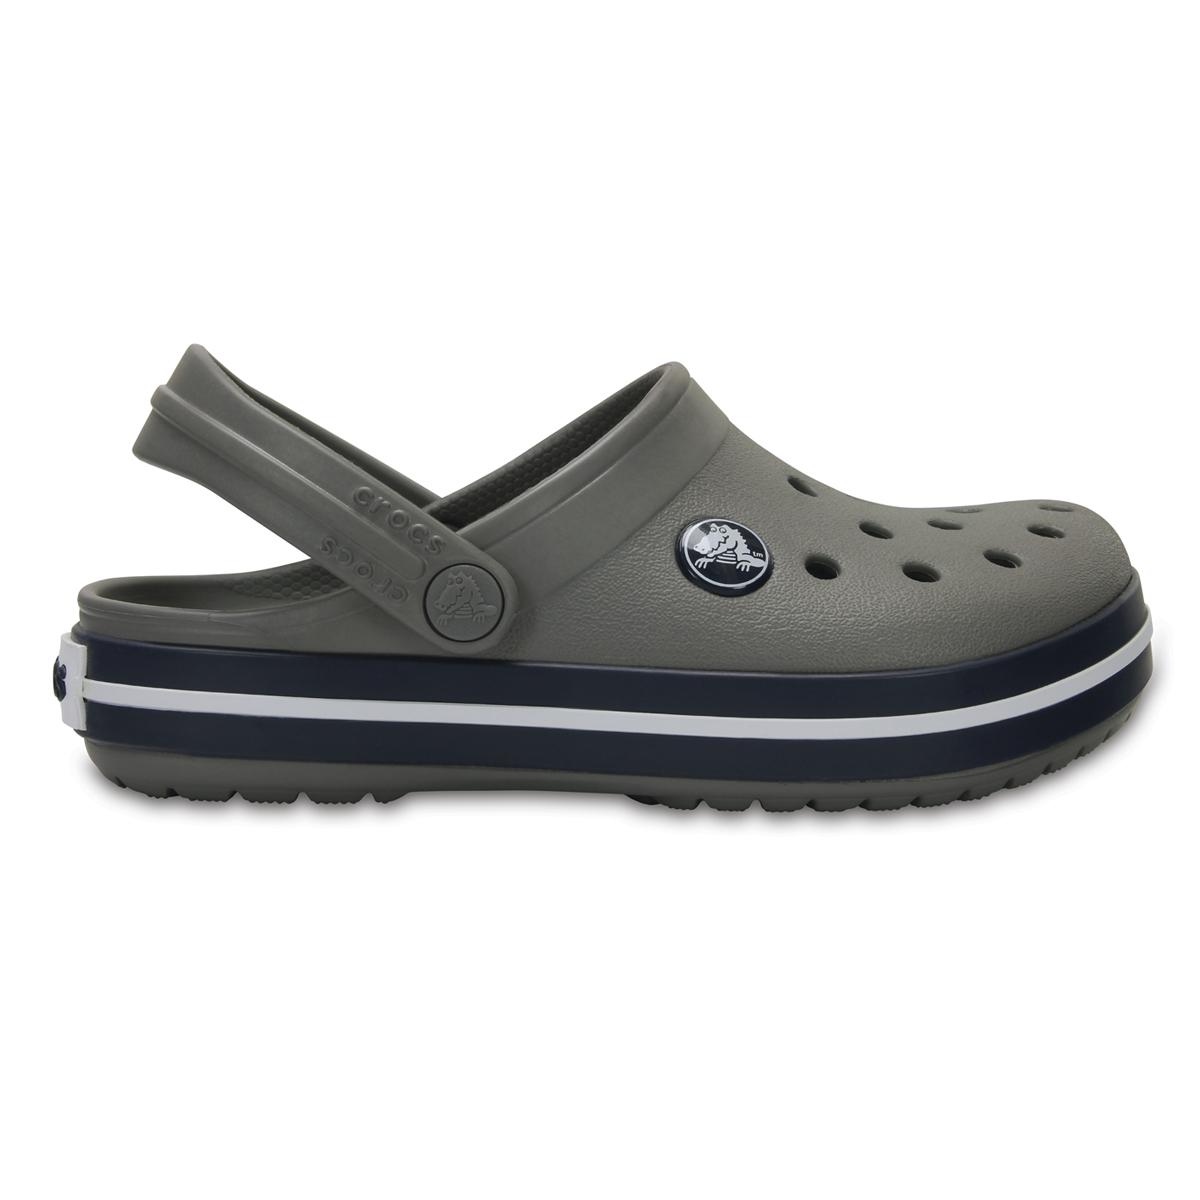 Crocs Crocband Clog K - Duman/Lacivert